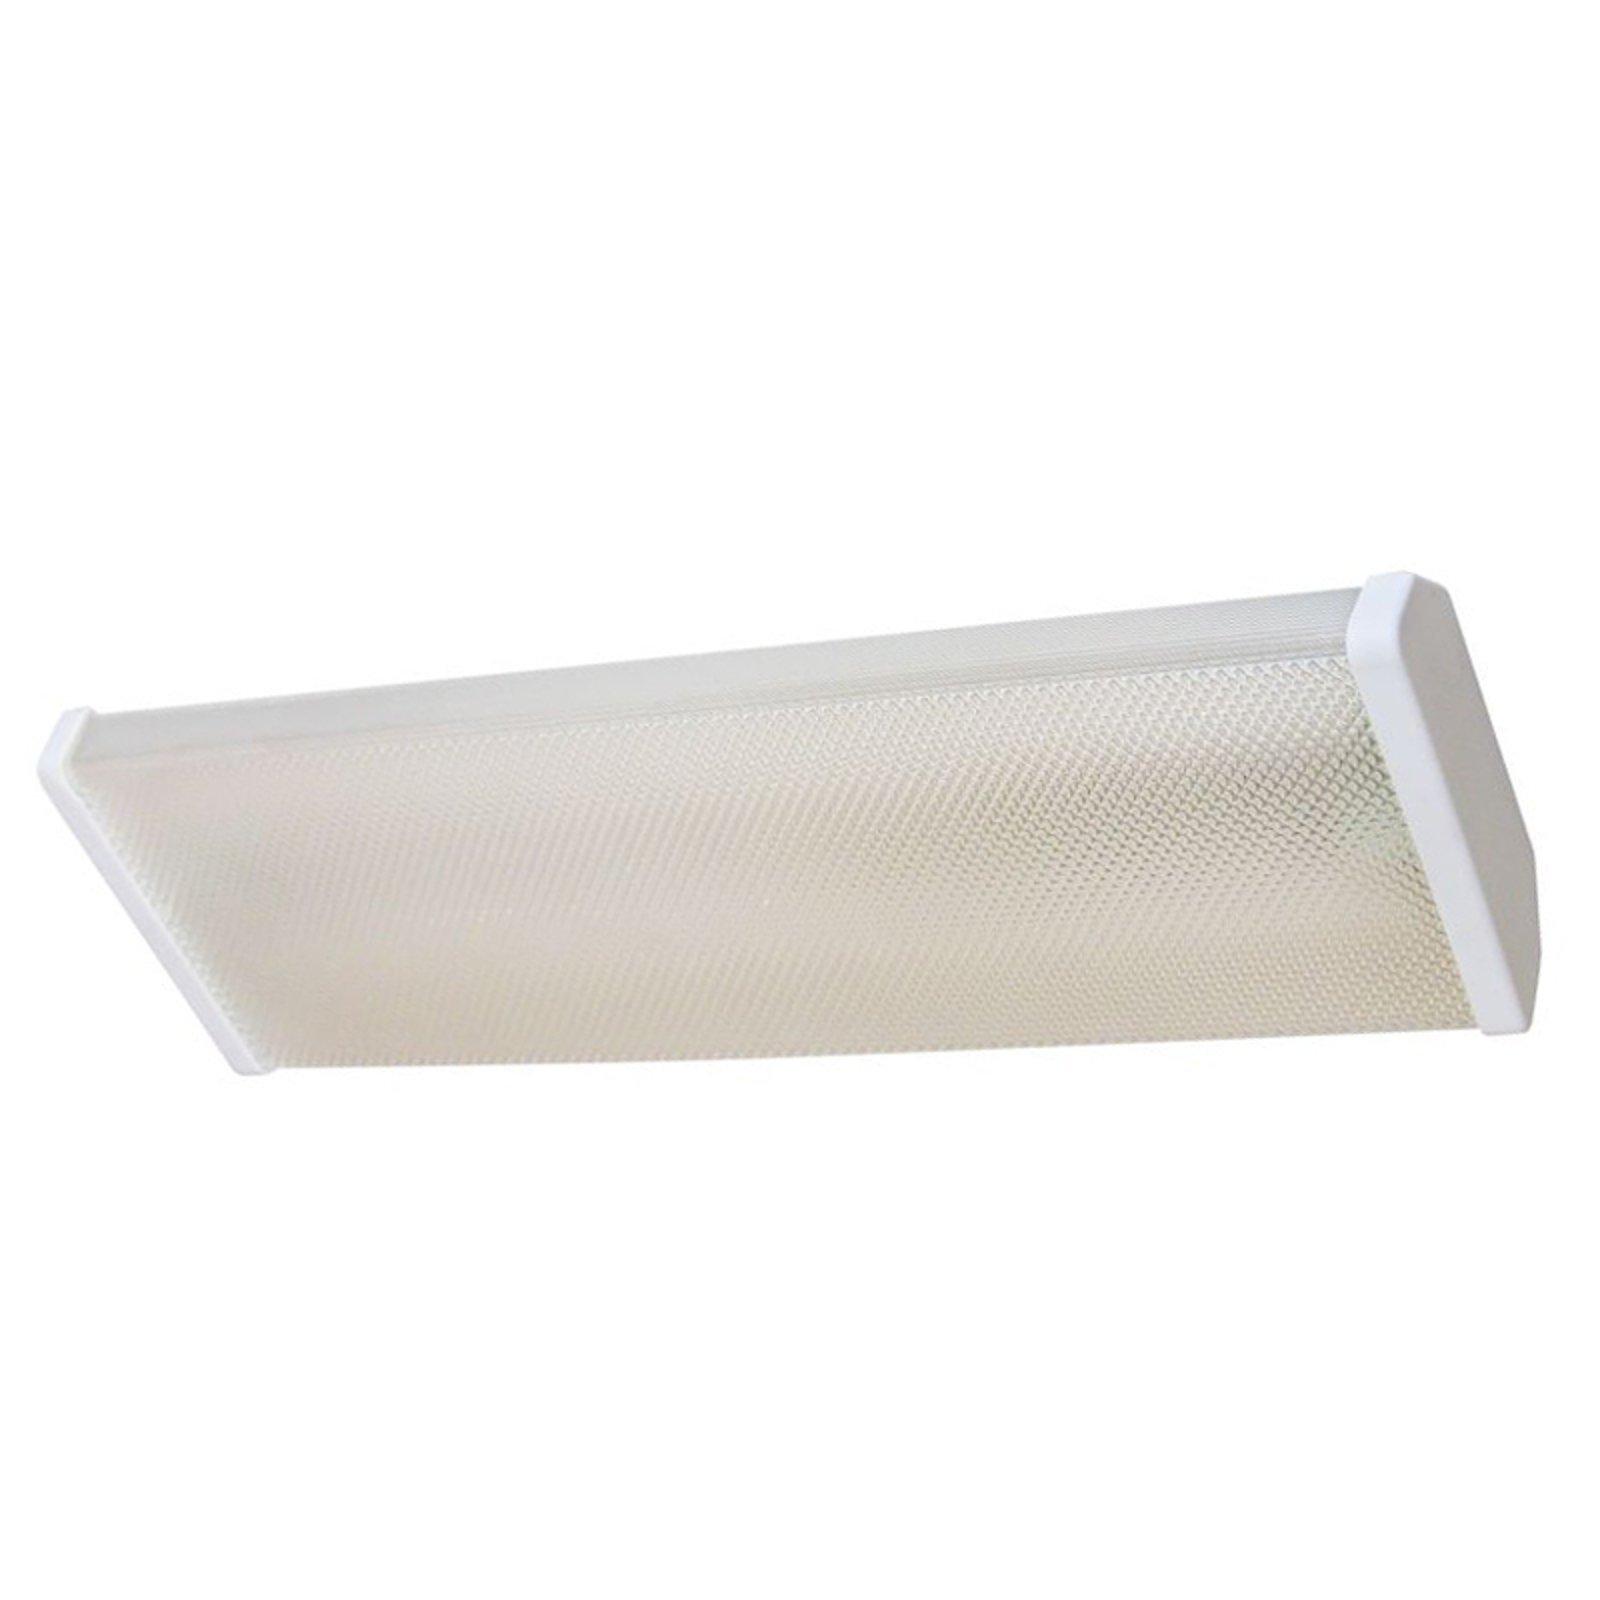 Lavt forbruks taklamper Prismatik LED 18 W